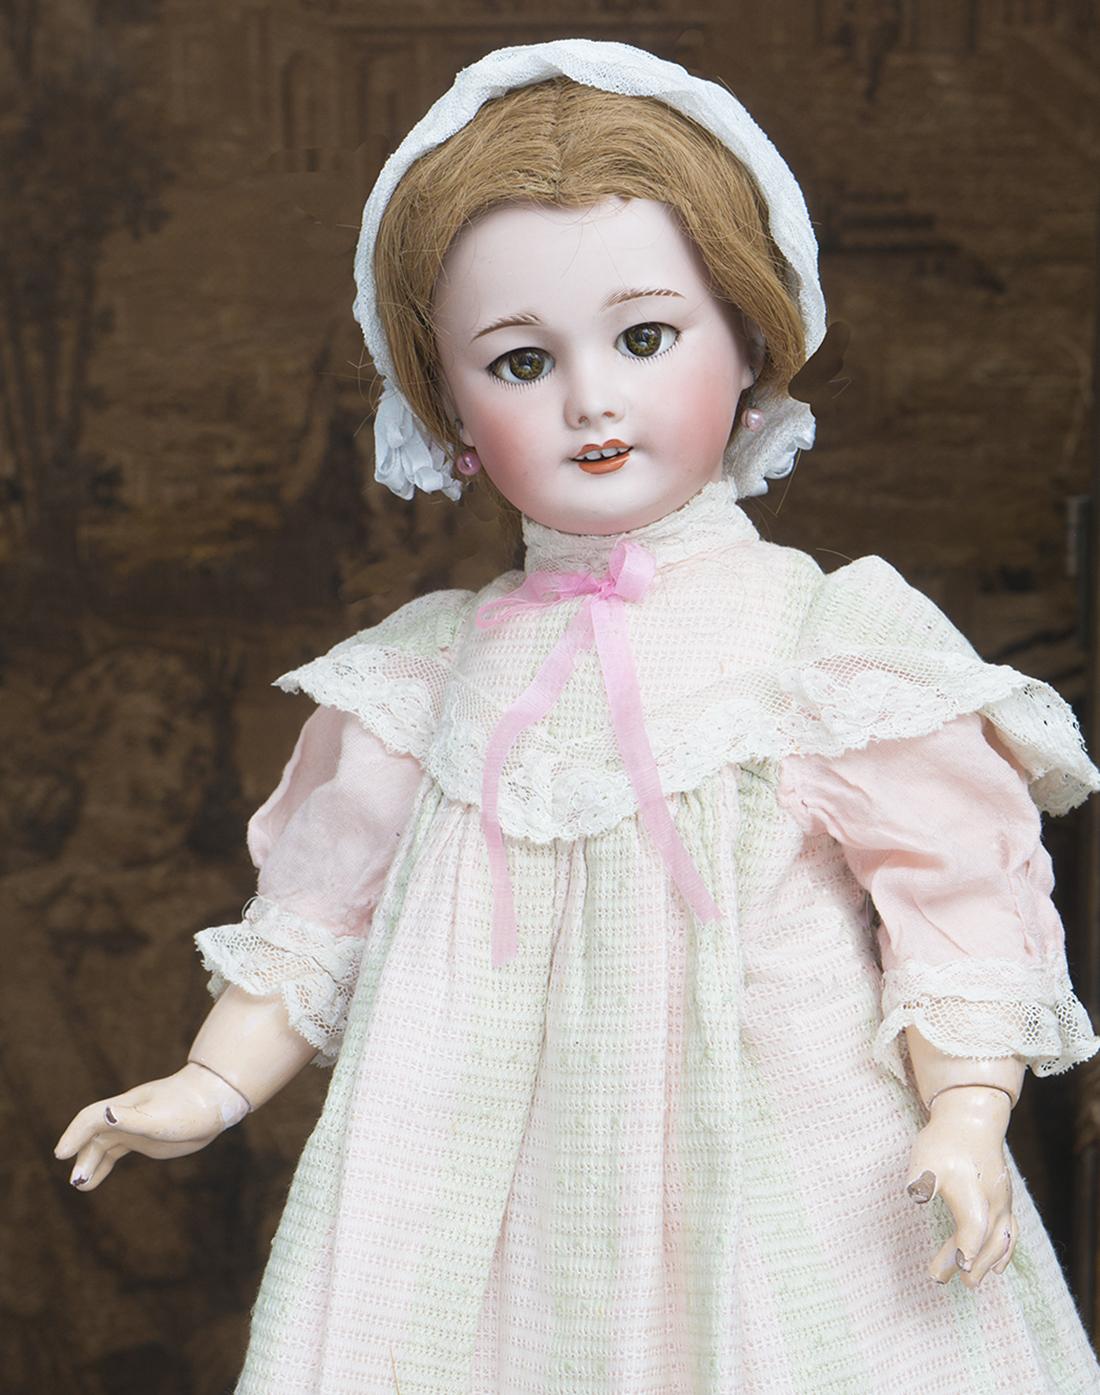 56 cм Кукла SFBJ Paris 301